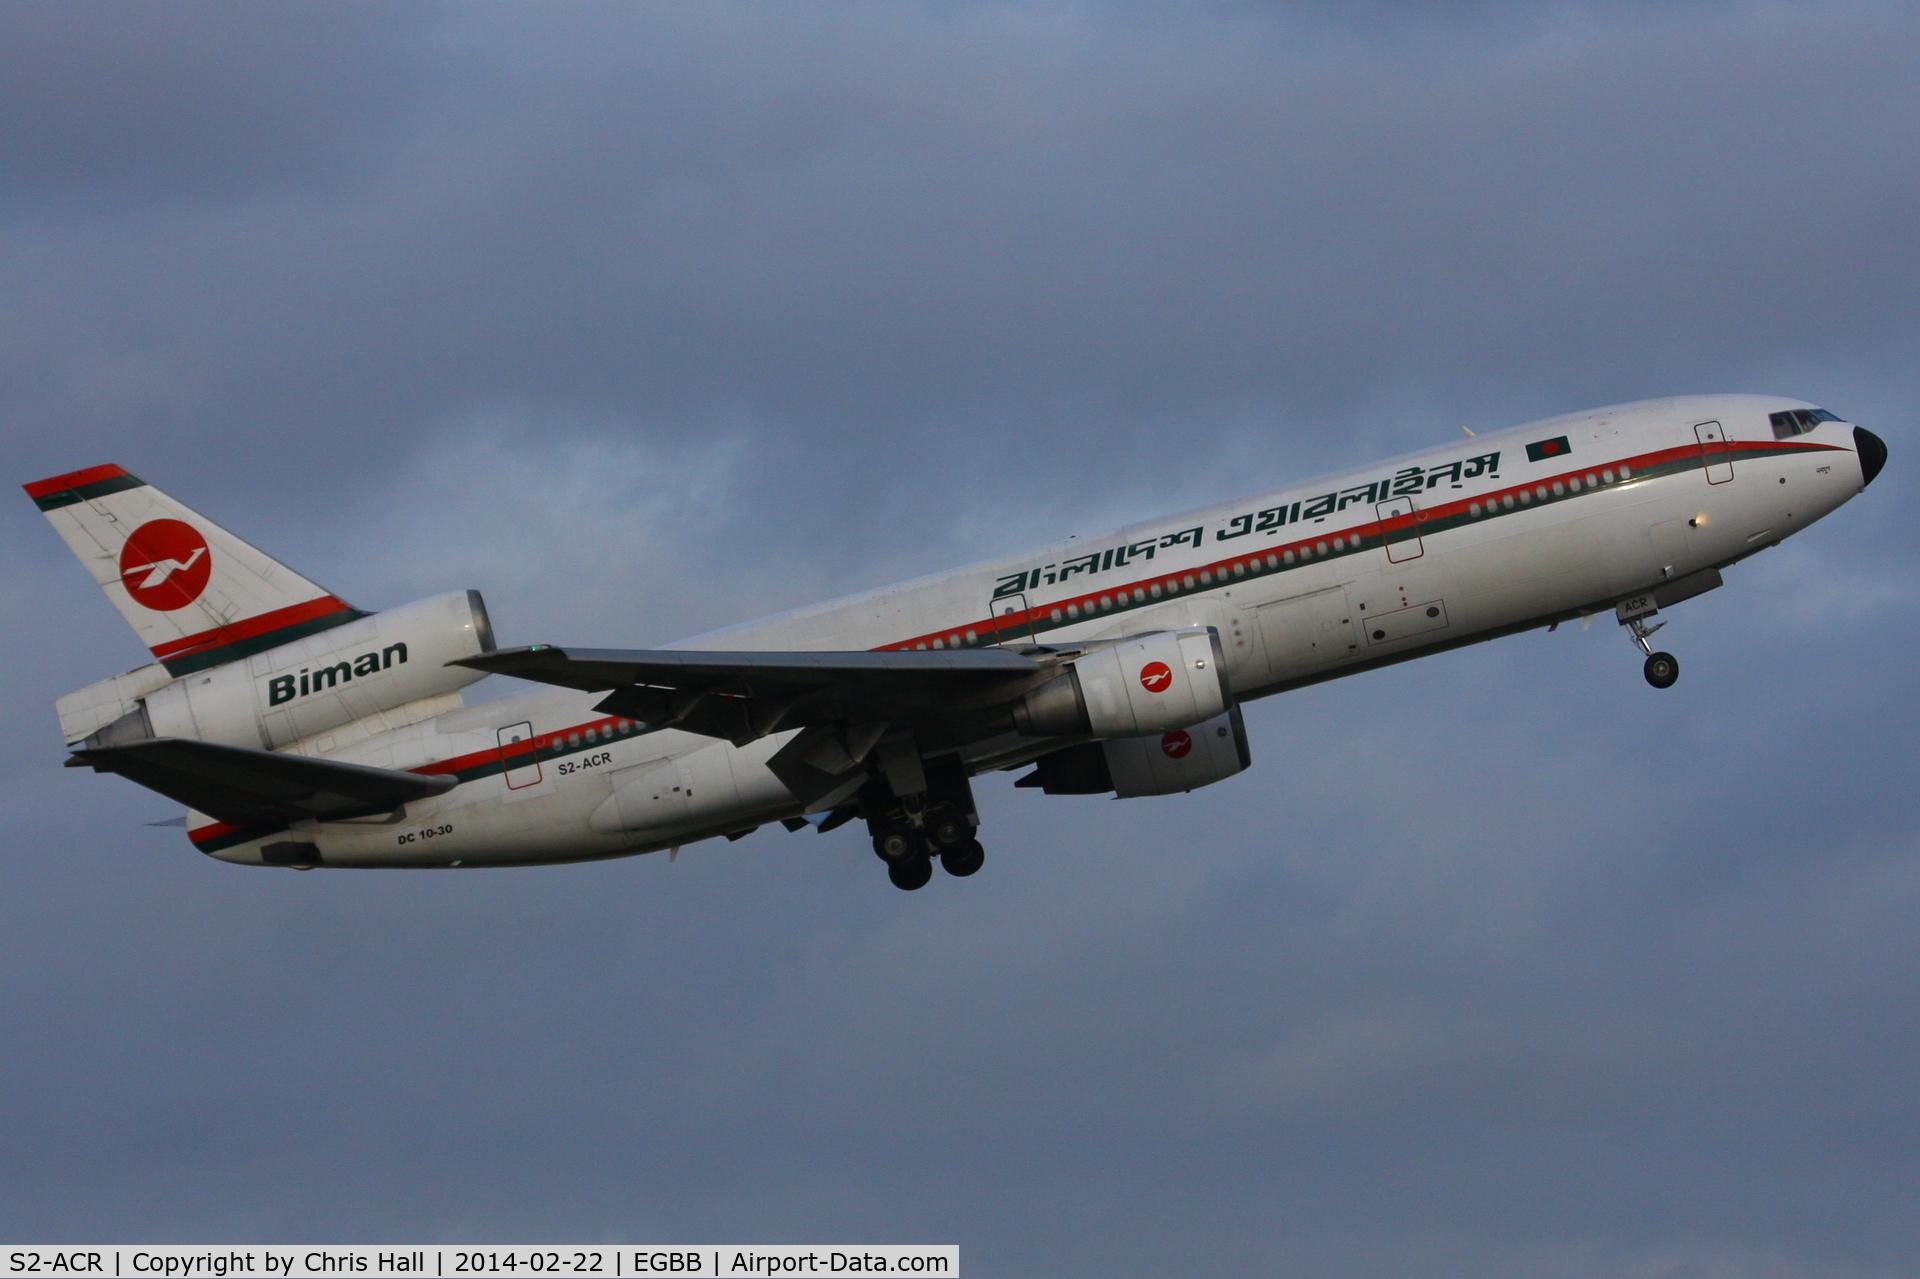 S2-ACR, 1988 McDonnell Douglas DC-10-30 C/N 48317, Biman Bangladesh Airlines